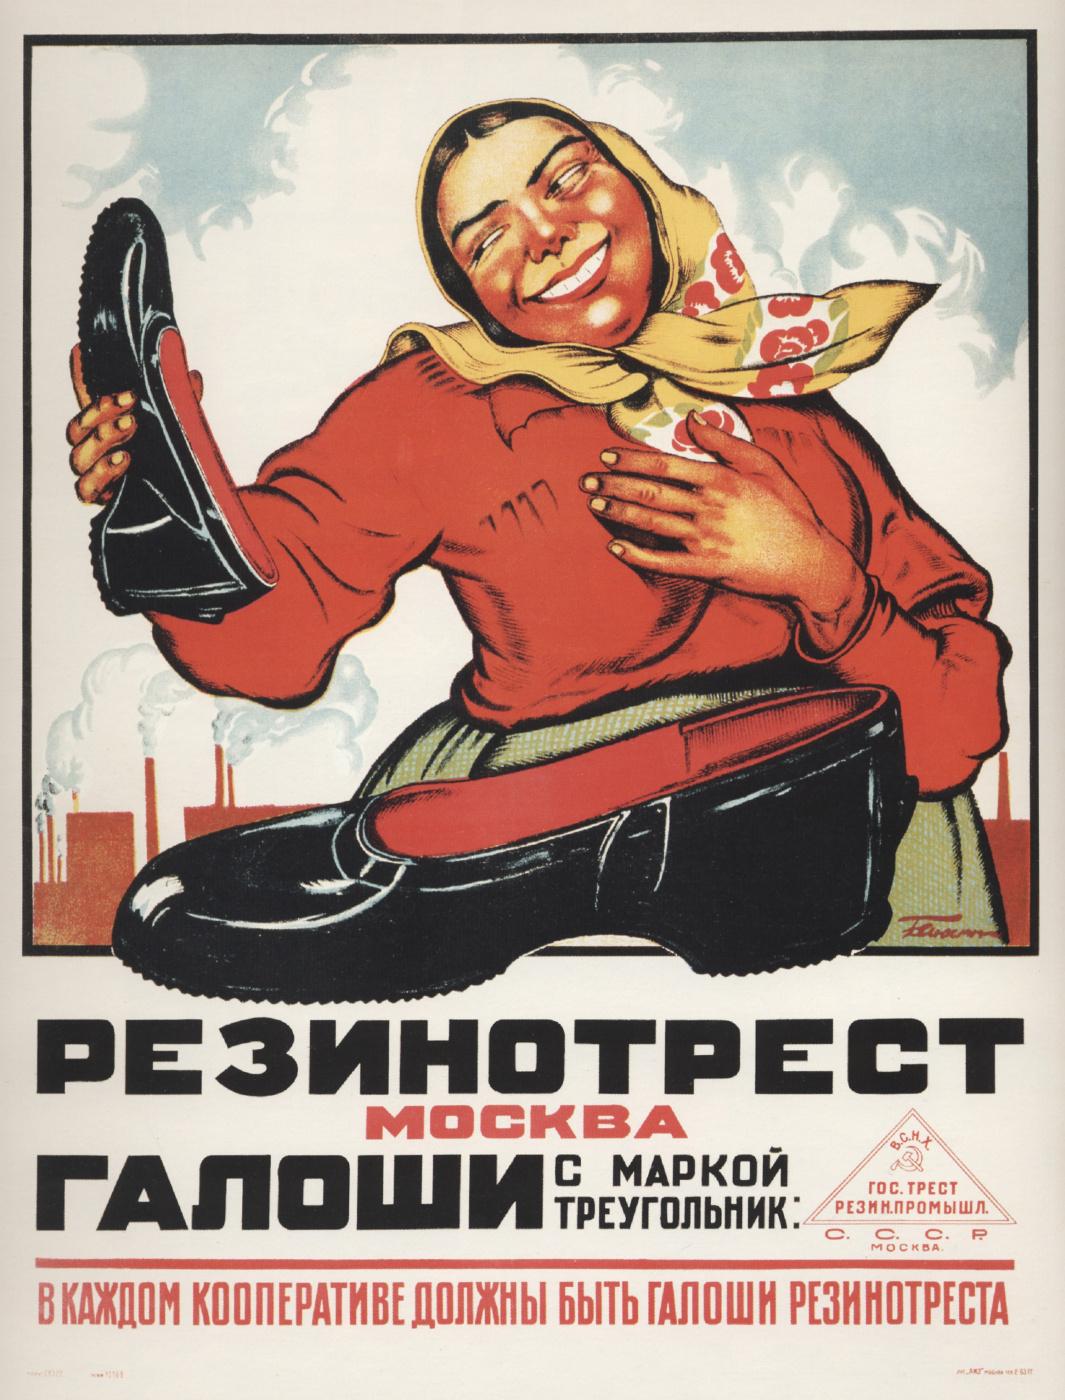 Vasily Stepanovich Bajuskin. Resinates Moscow. Galoshes with the brand triangle. Each cooperative must be galoshes rezinotresta